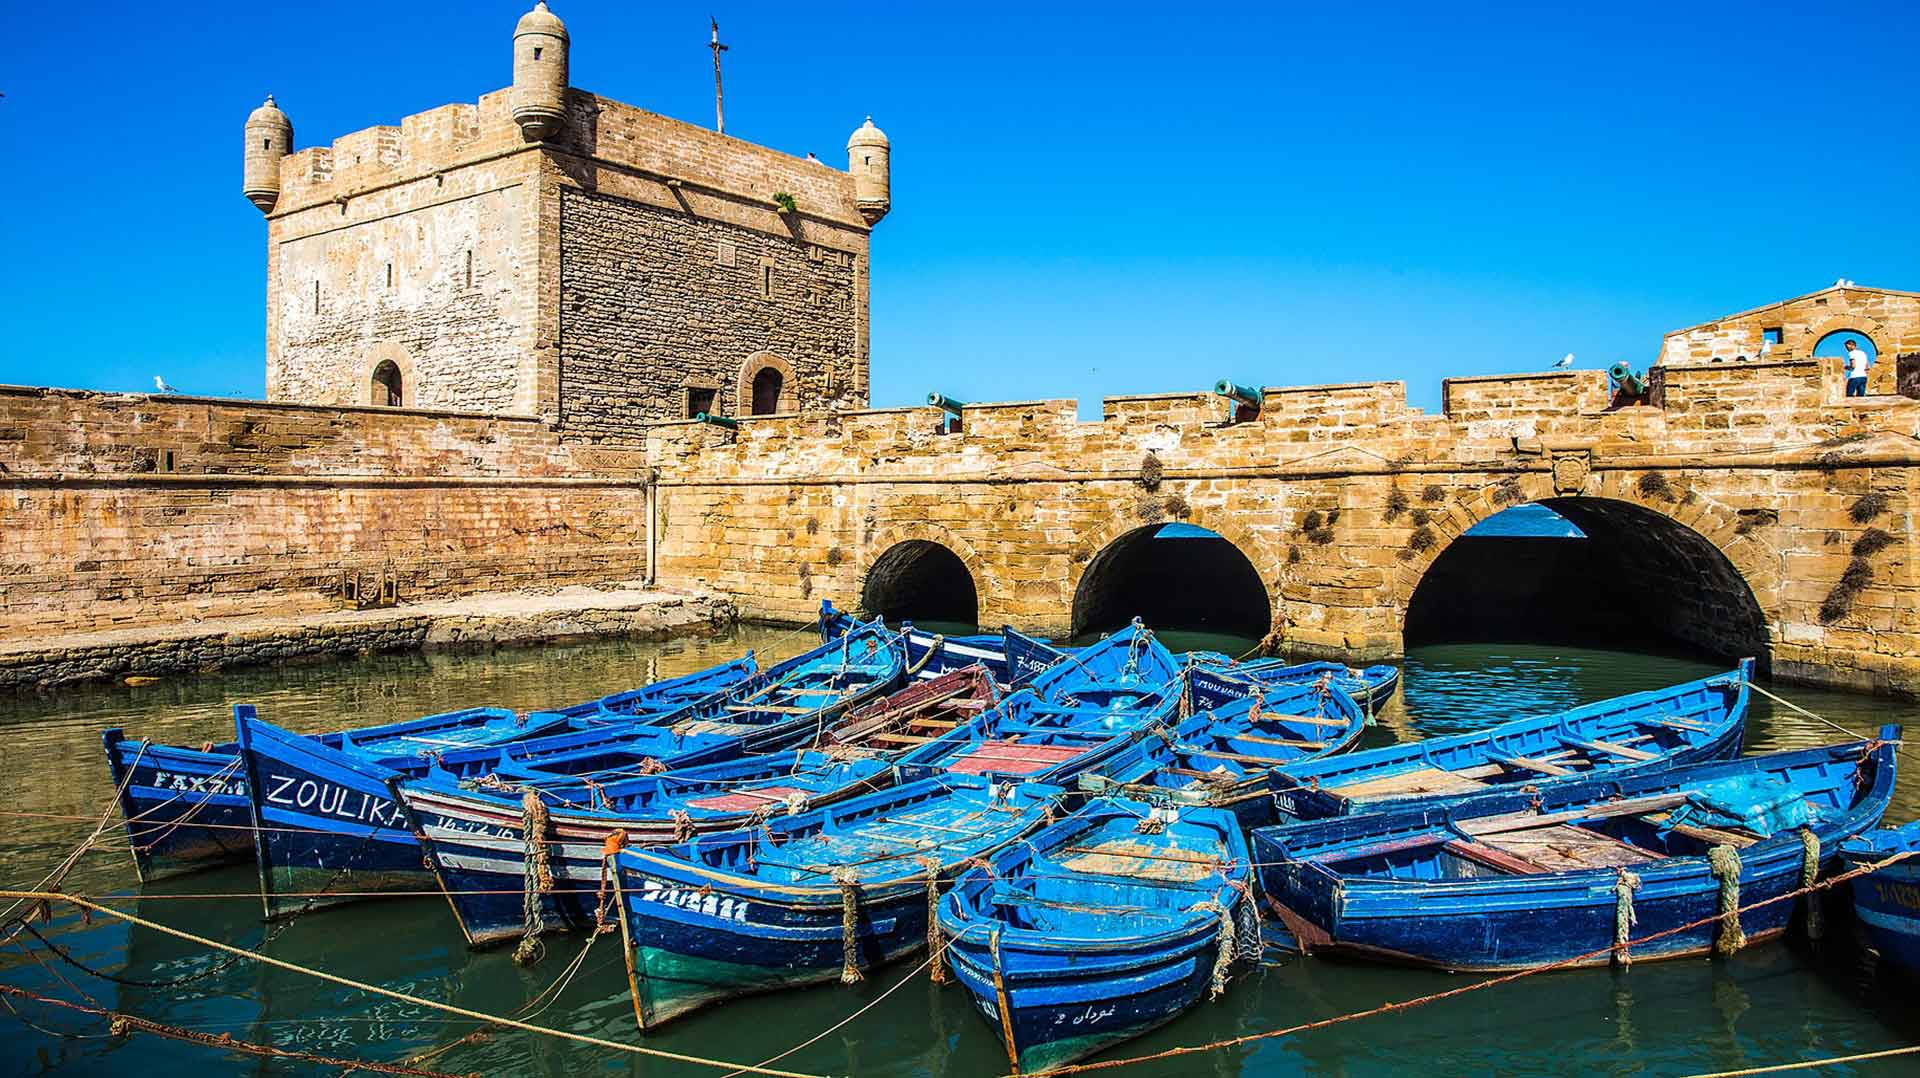 Day Trip to Essaouira City from Marrakech